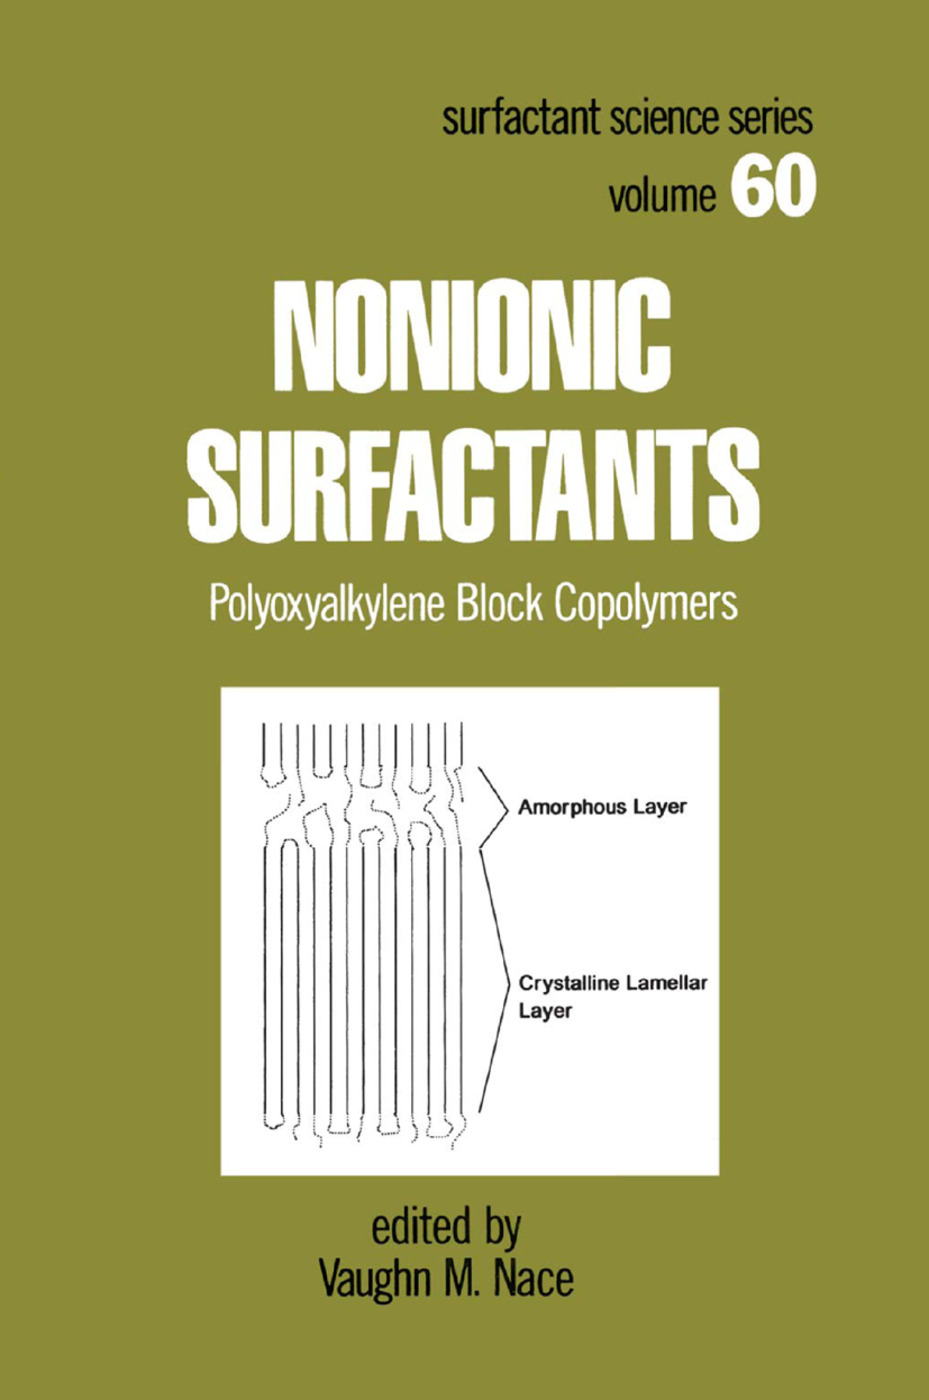 Nonionic Surfactants: Polyoxyalkylene Block Copolymers, 1st Edition (Paperback) book cover